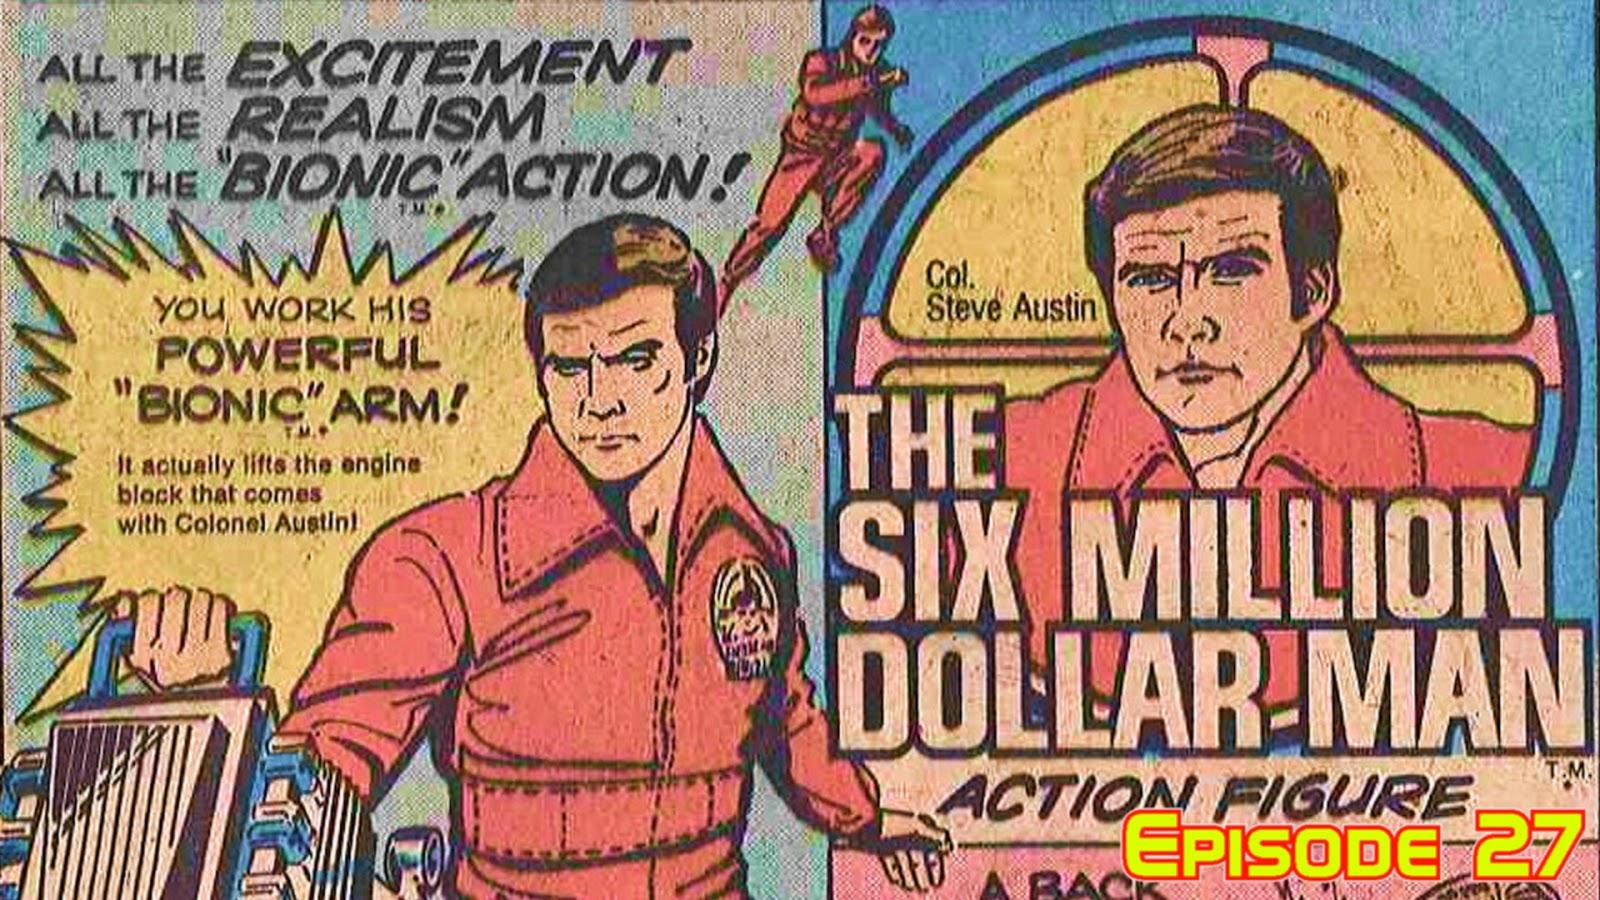 Episode 27 The Six Million Dollar Man